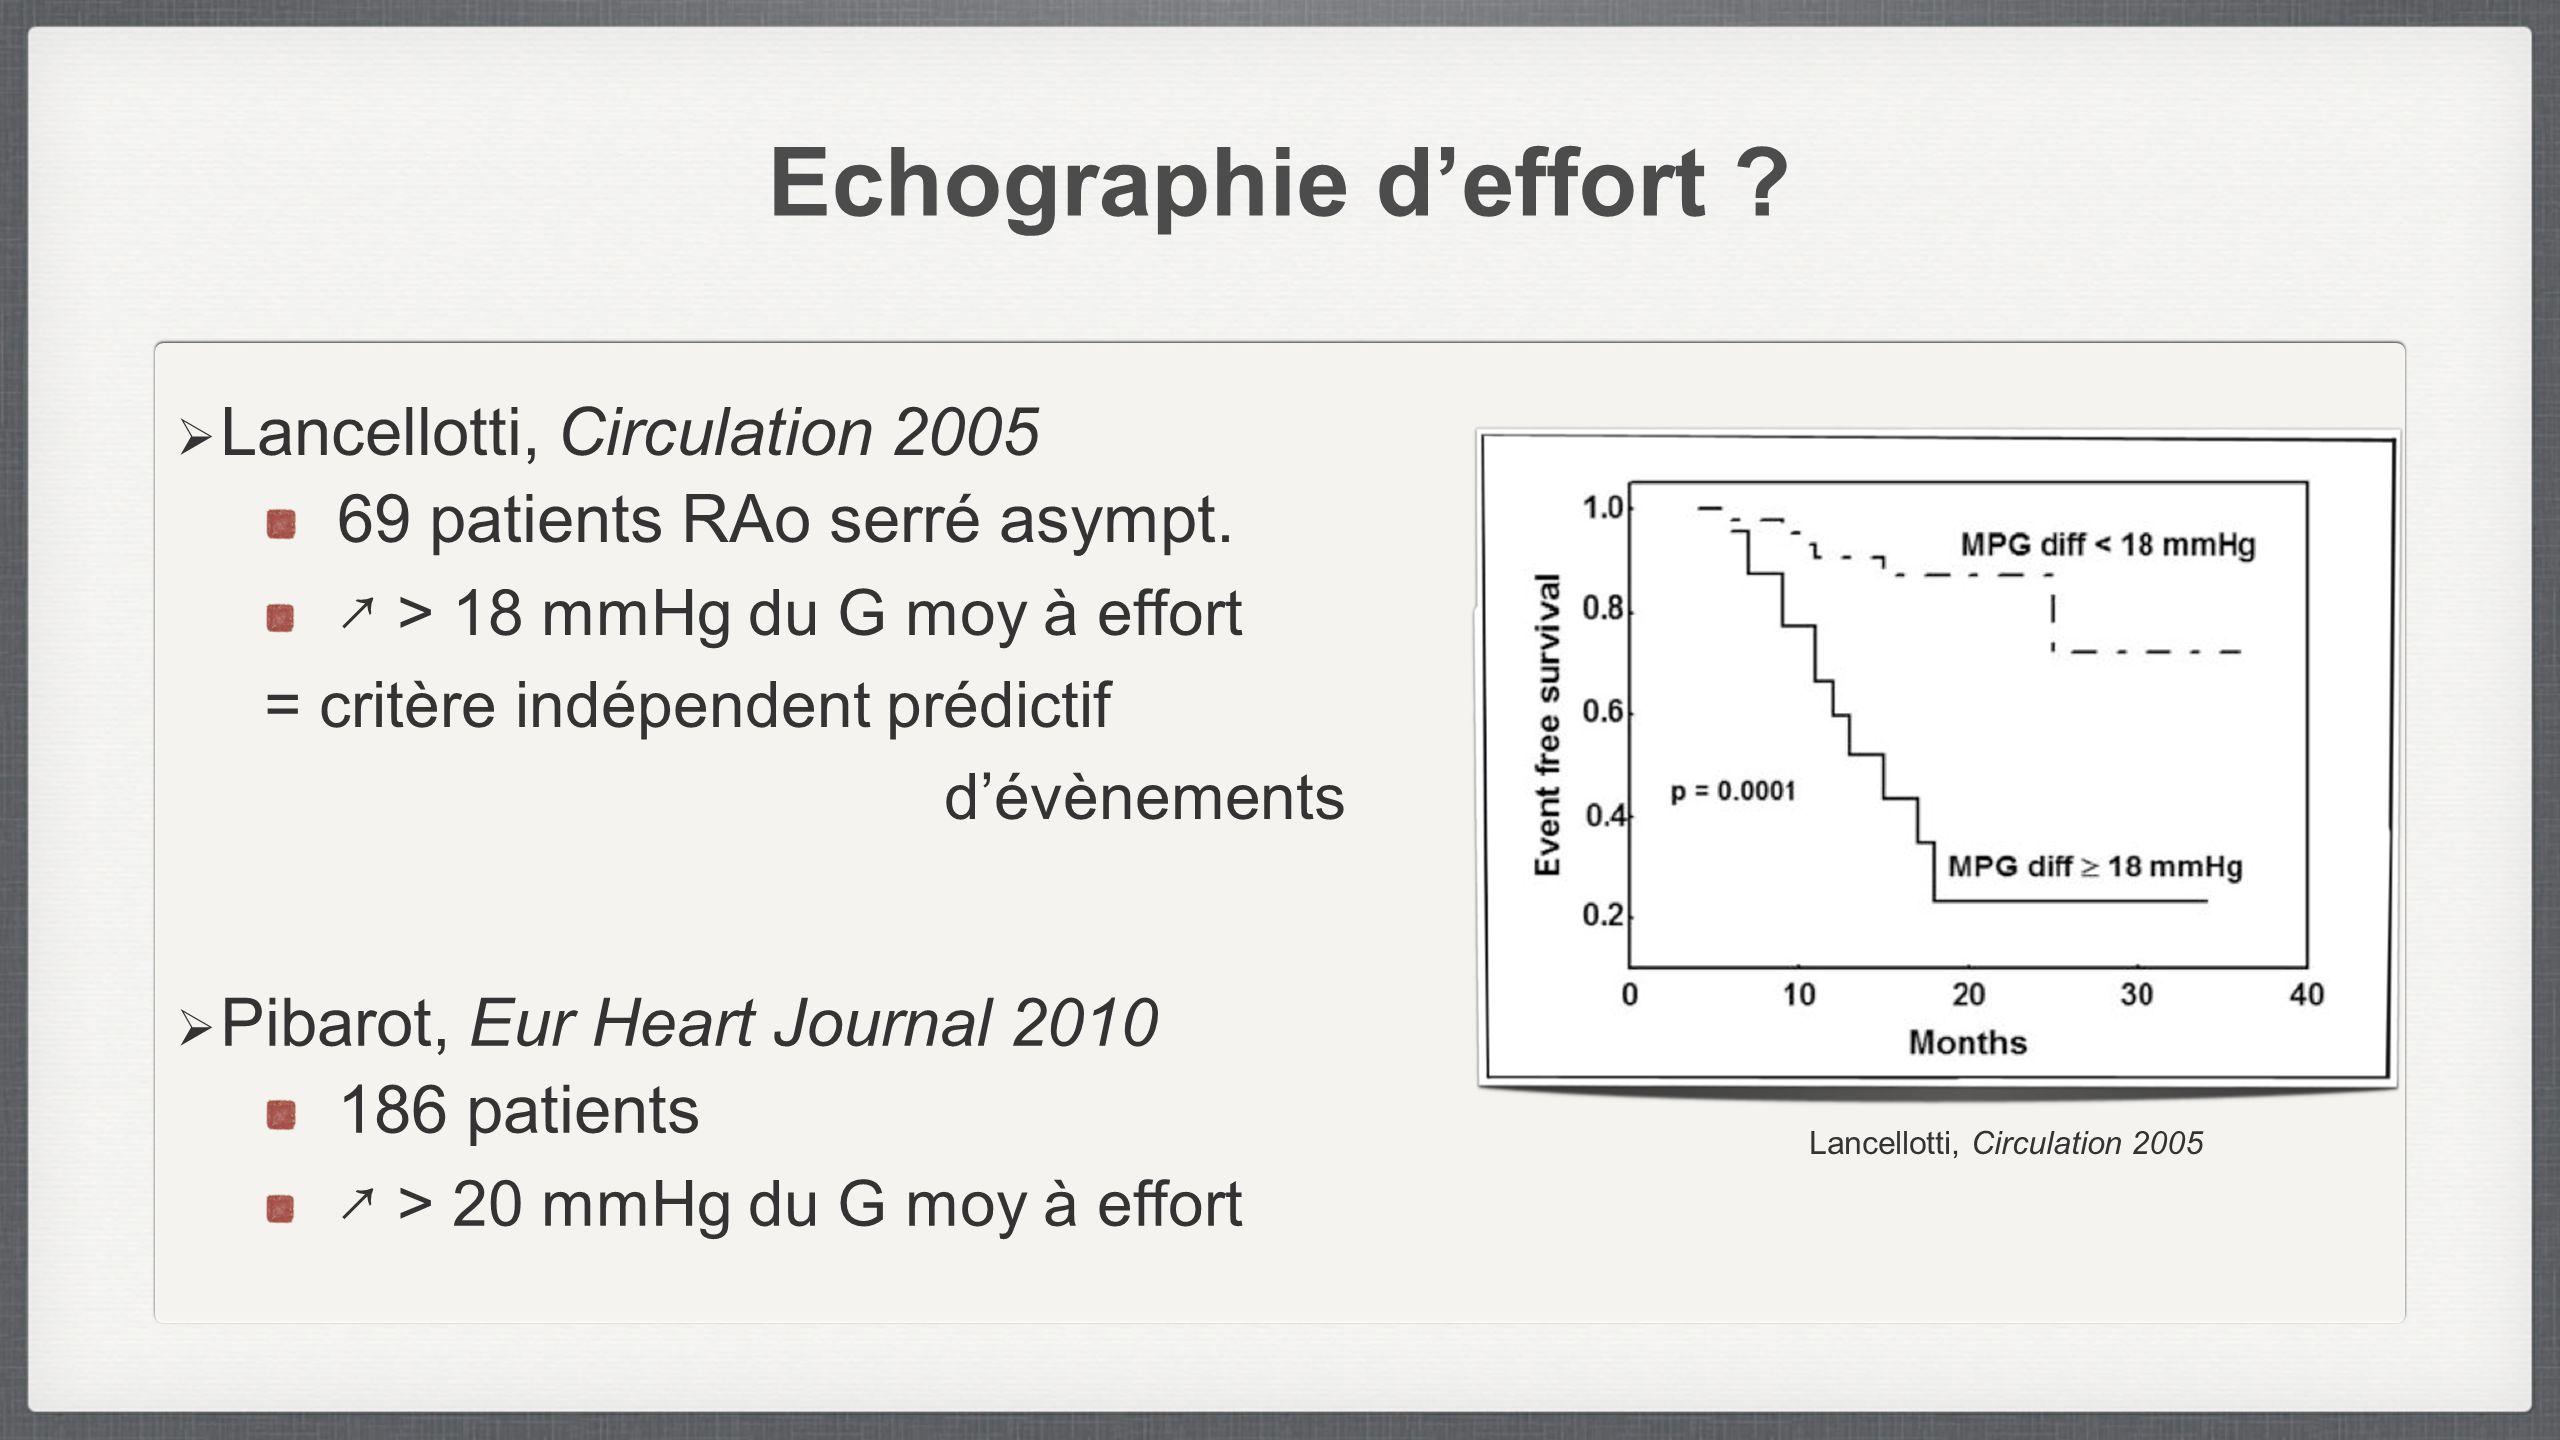 Echographie deffort ? Pibarot, Eur Heart Journal 2010 186 patients > 20 mmHg du G moy à effort Lancellotti, Circulation 2005 69 patients RAo serré asy